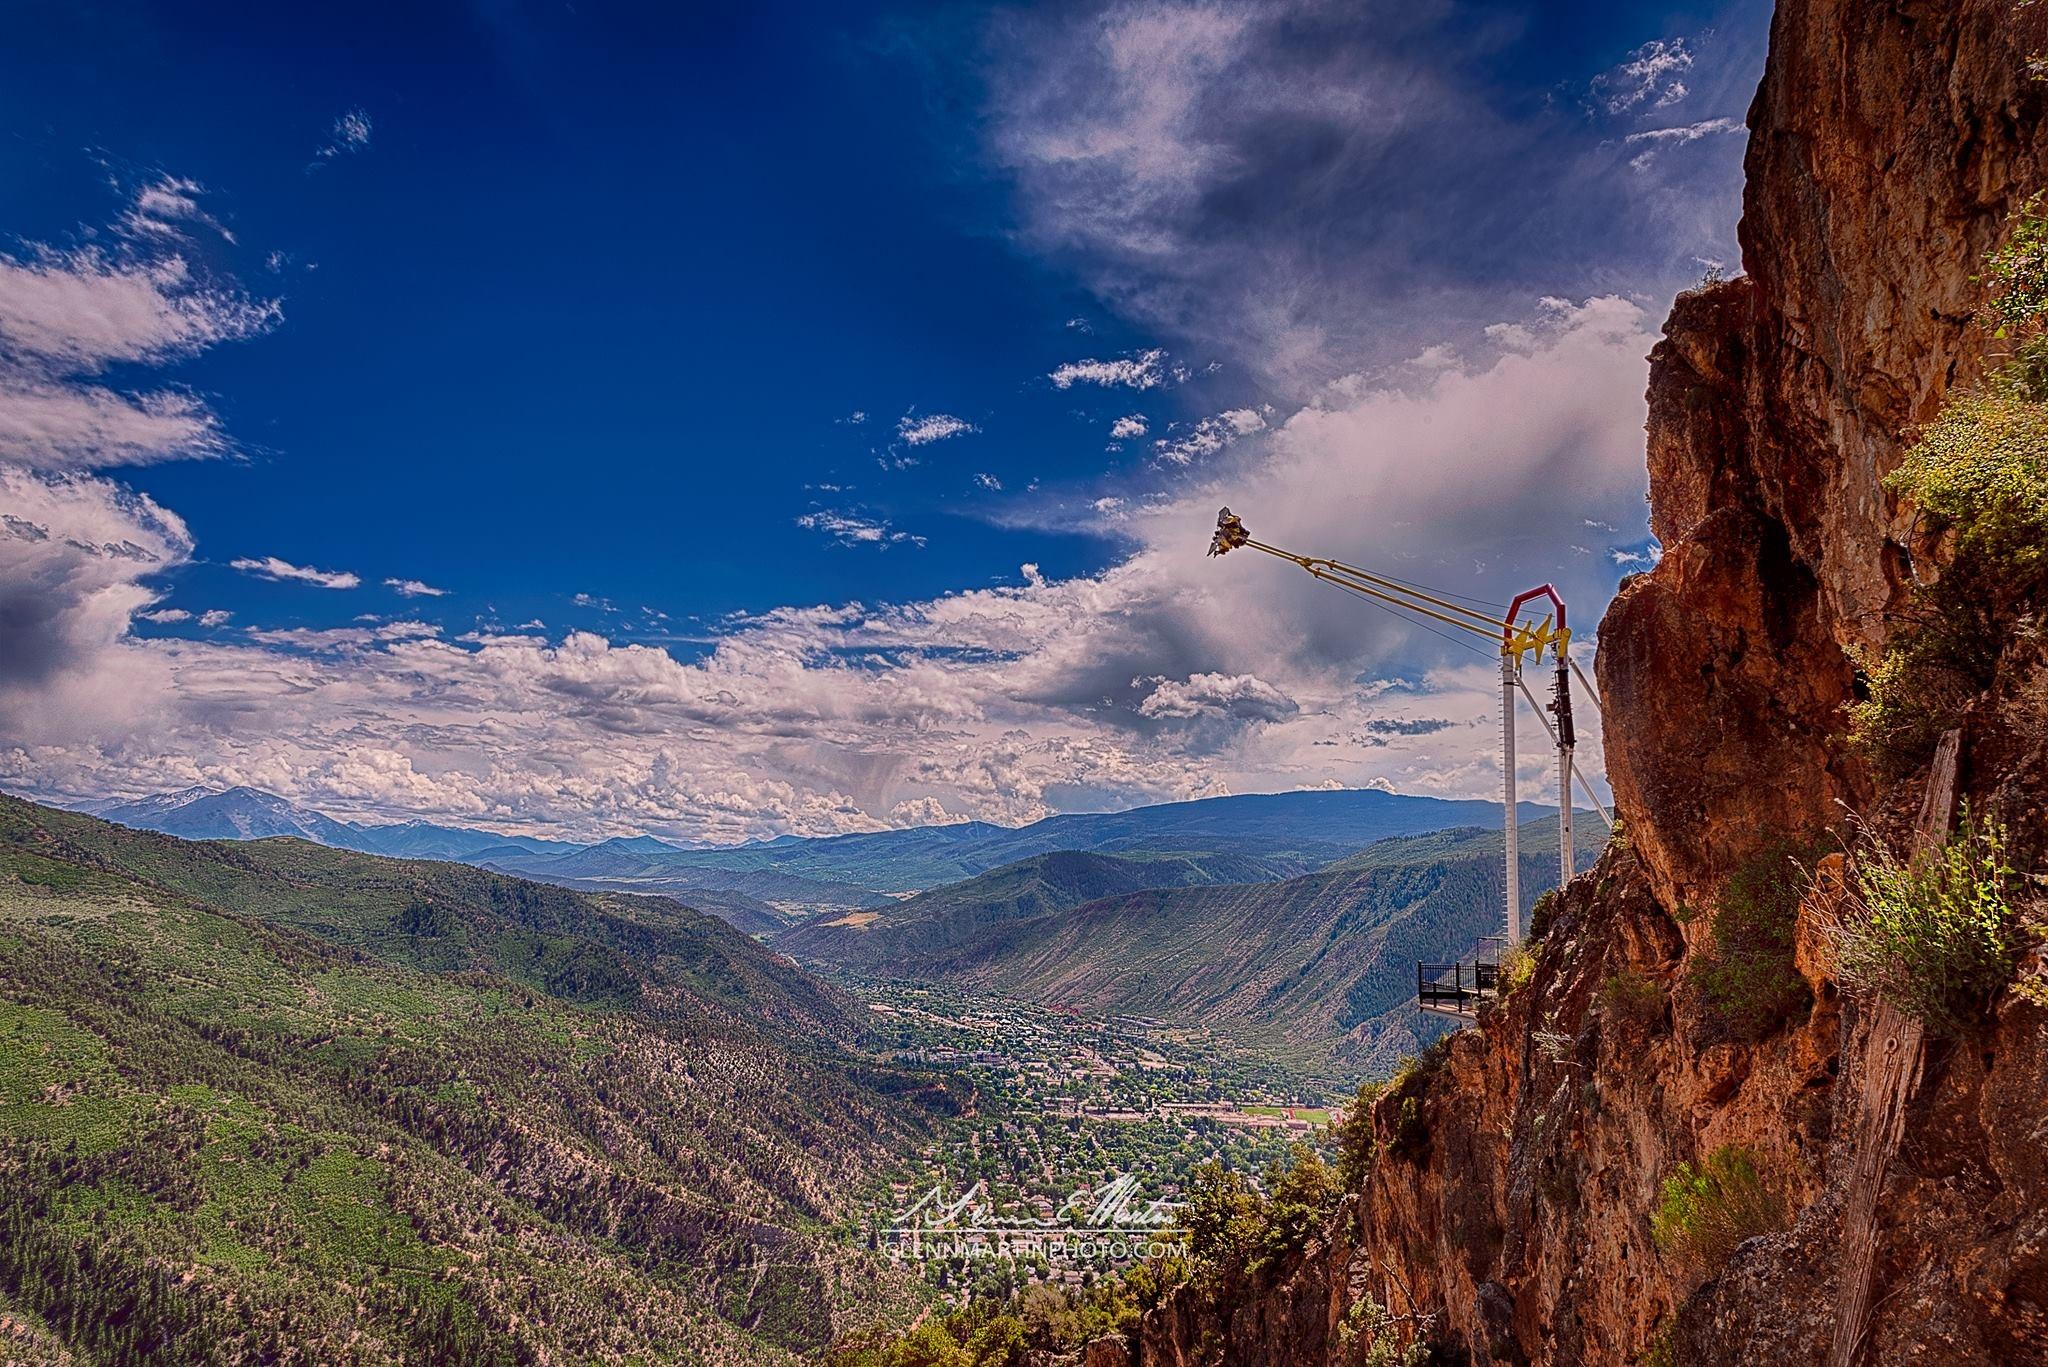 Canyon Swing by Glenn Martin